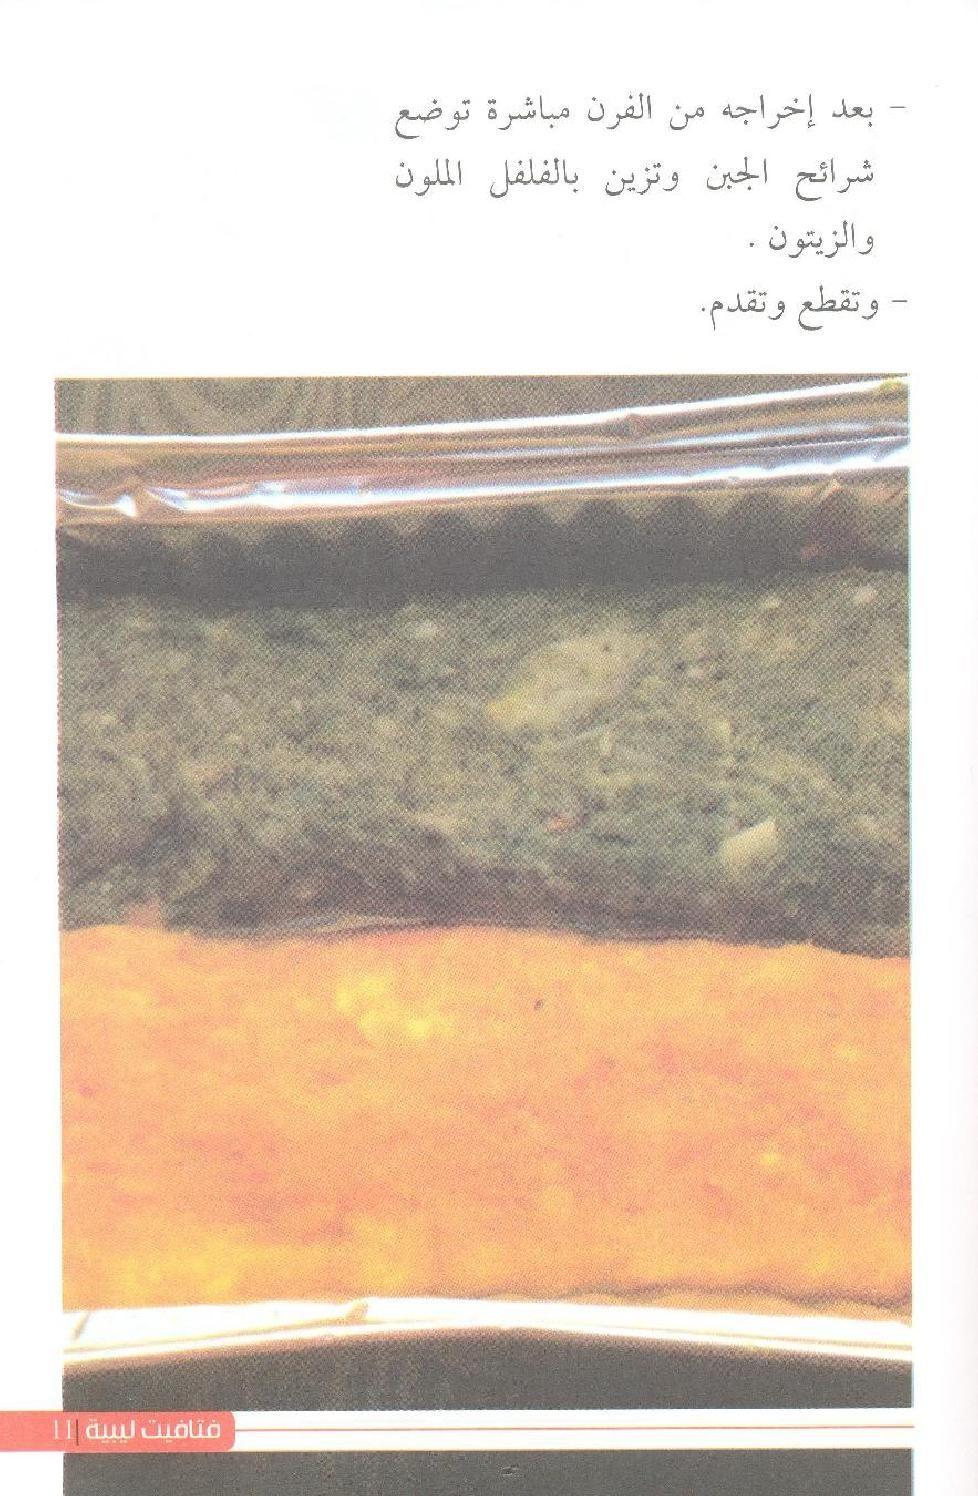 Pdf Print كتاب فتافيت ليبية 2016 By ميس الريم Issuu Fatafeat Print Painting